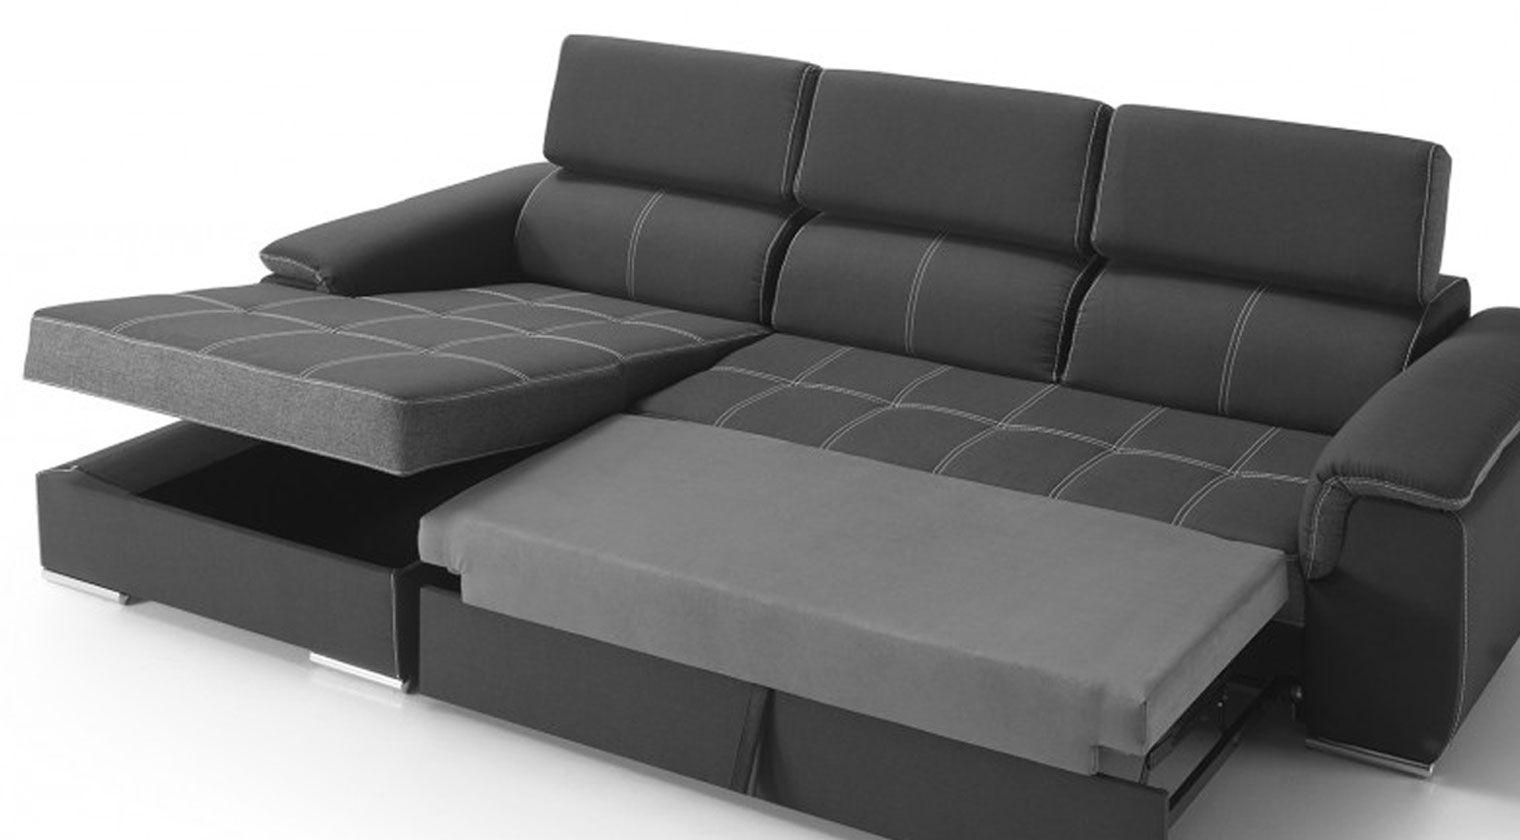 Sofa Extensible Xtd6 Chaise Longue Kibo Fas Cama Extensible Nido